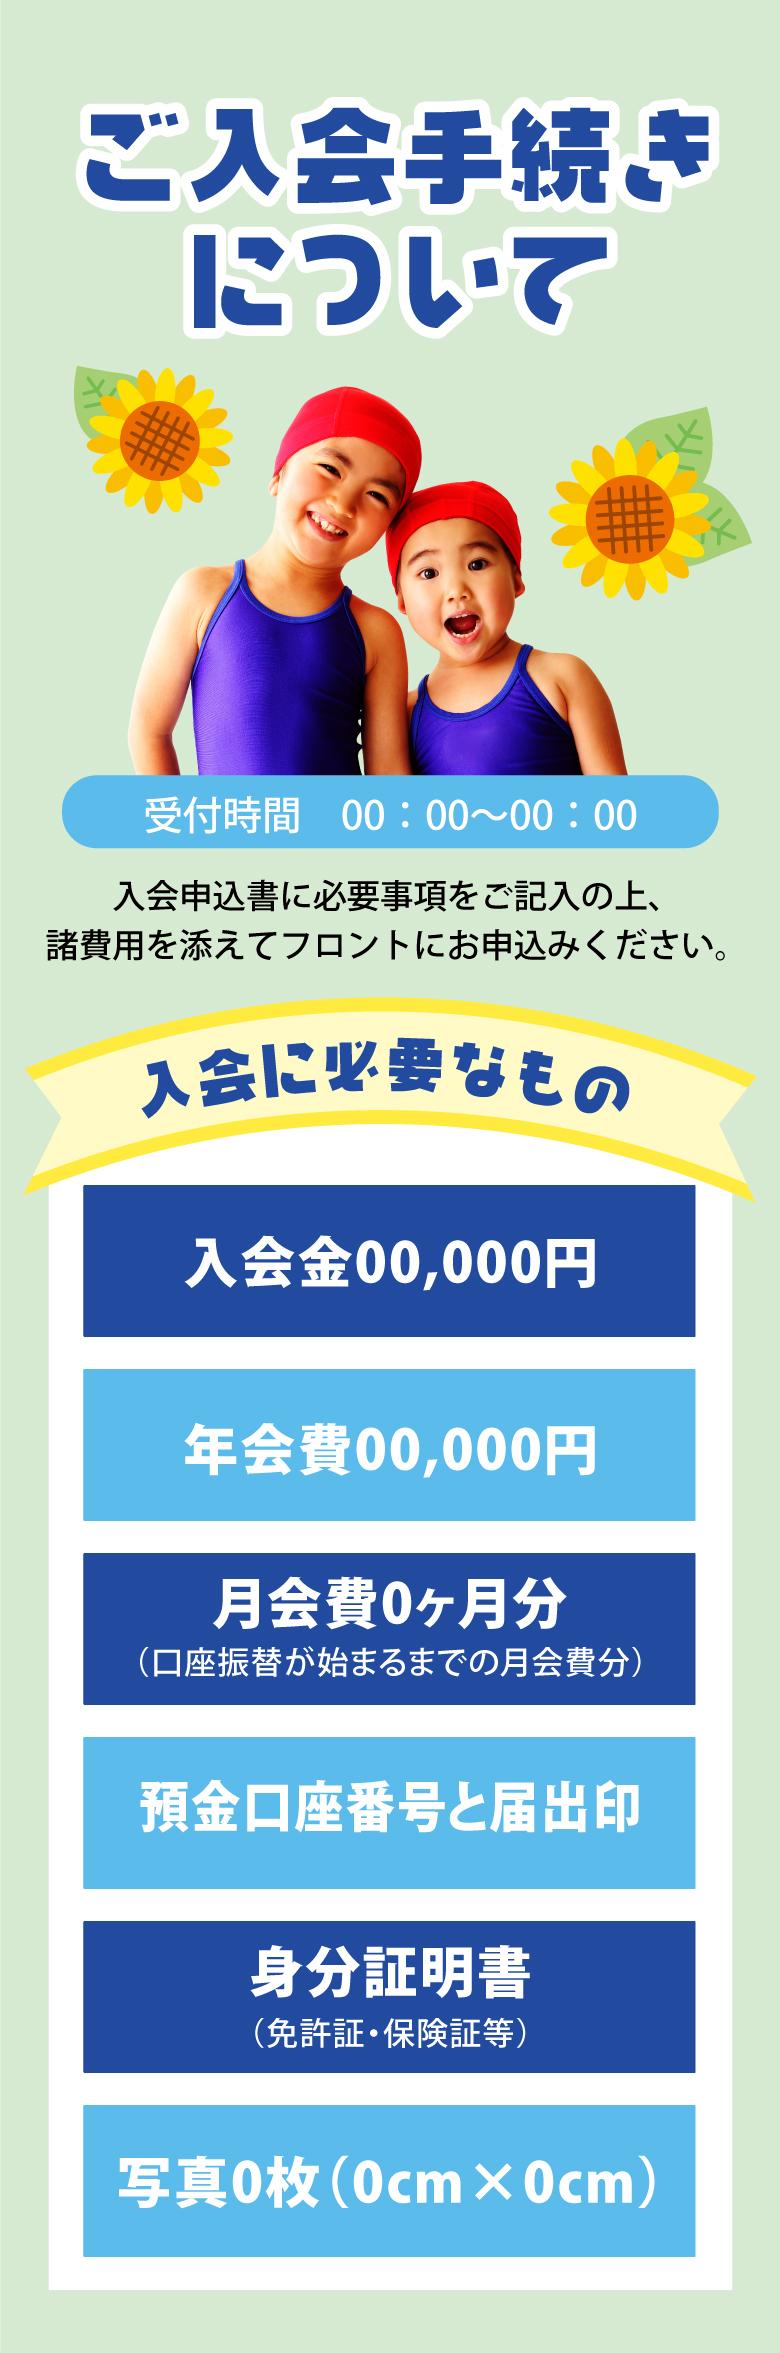 cd-cv-ch-21n-lp-cos-04